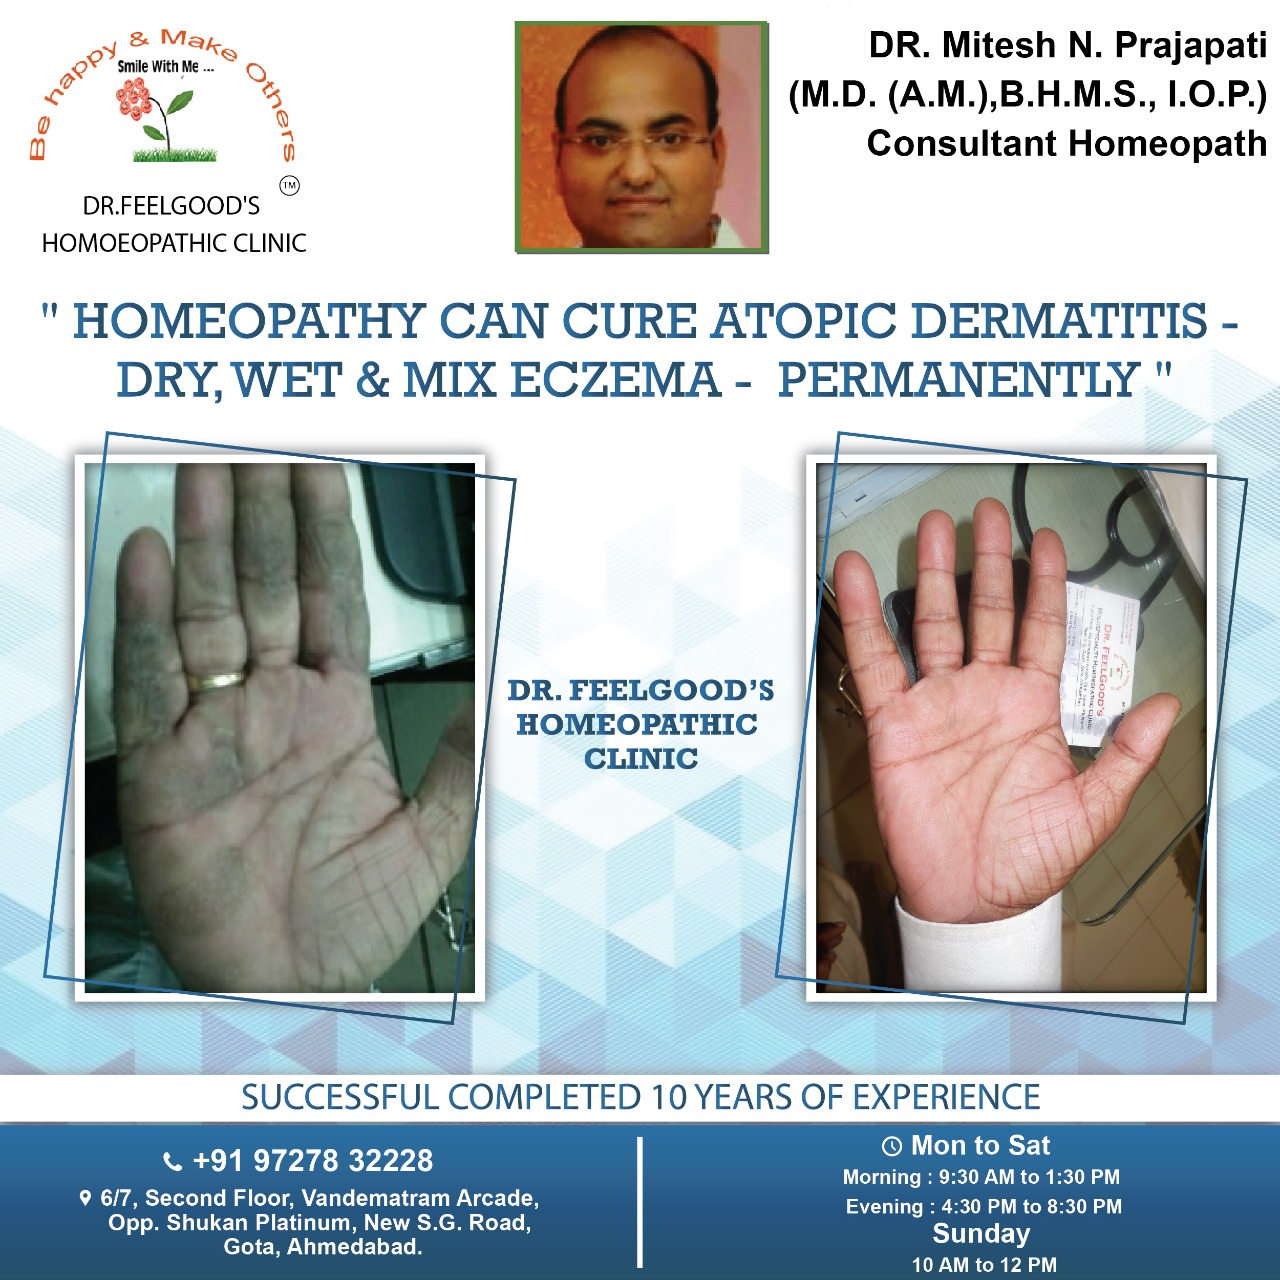 DR MITESH PRAJAPATI - HOMEOPATHY FOR ECZEMA (3)